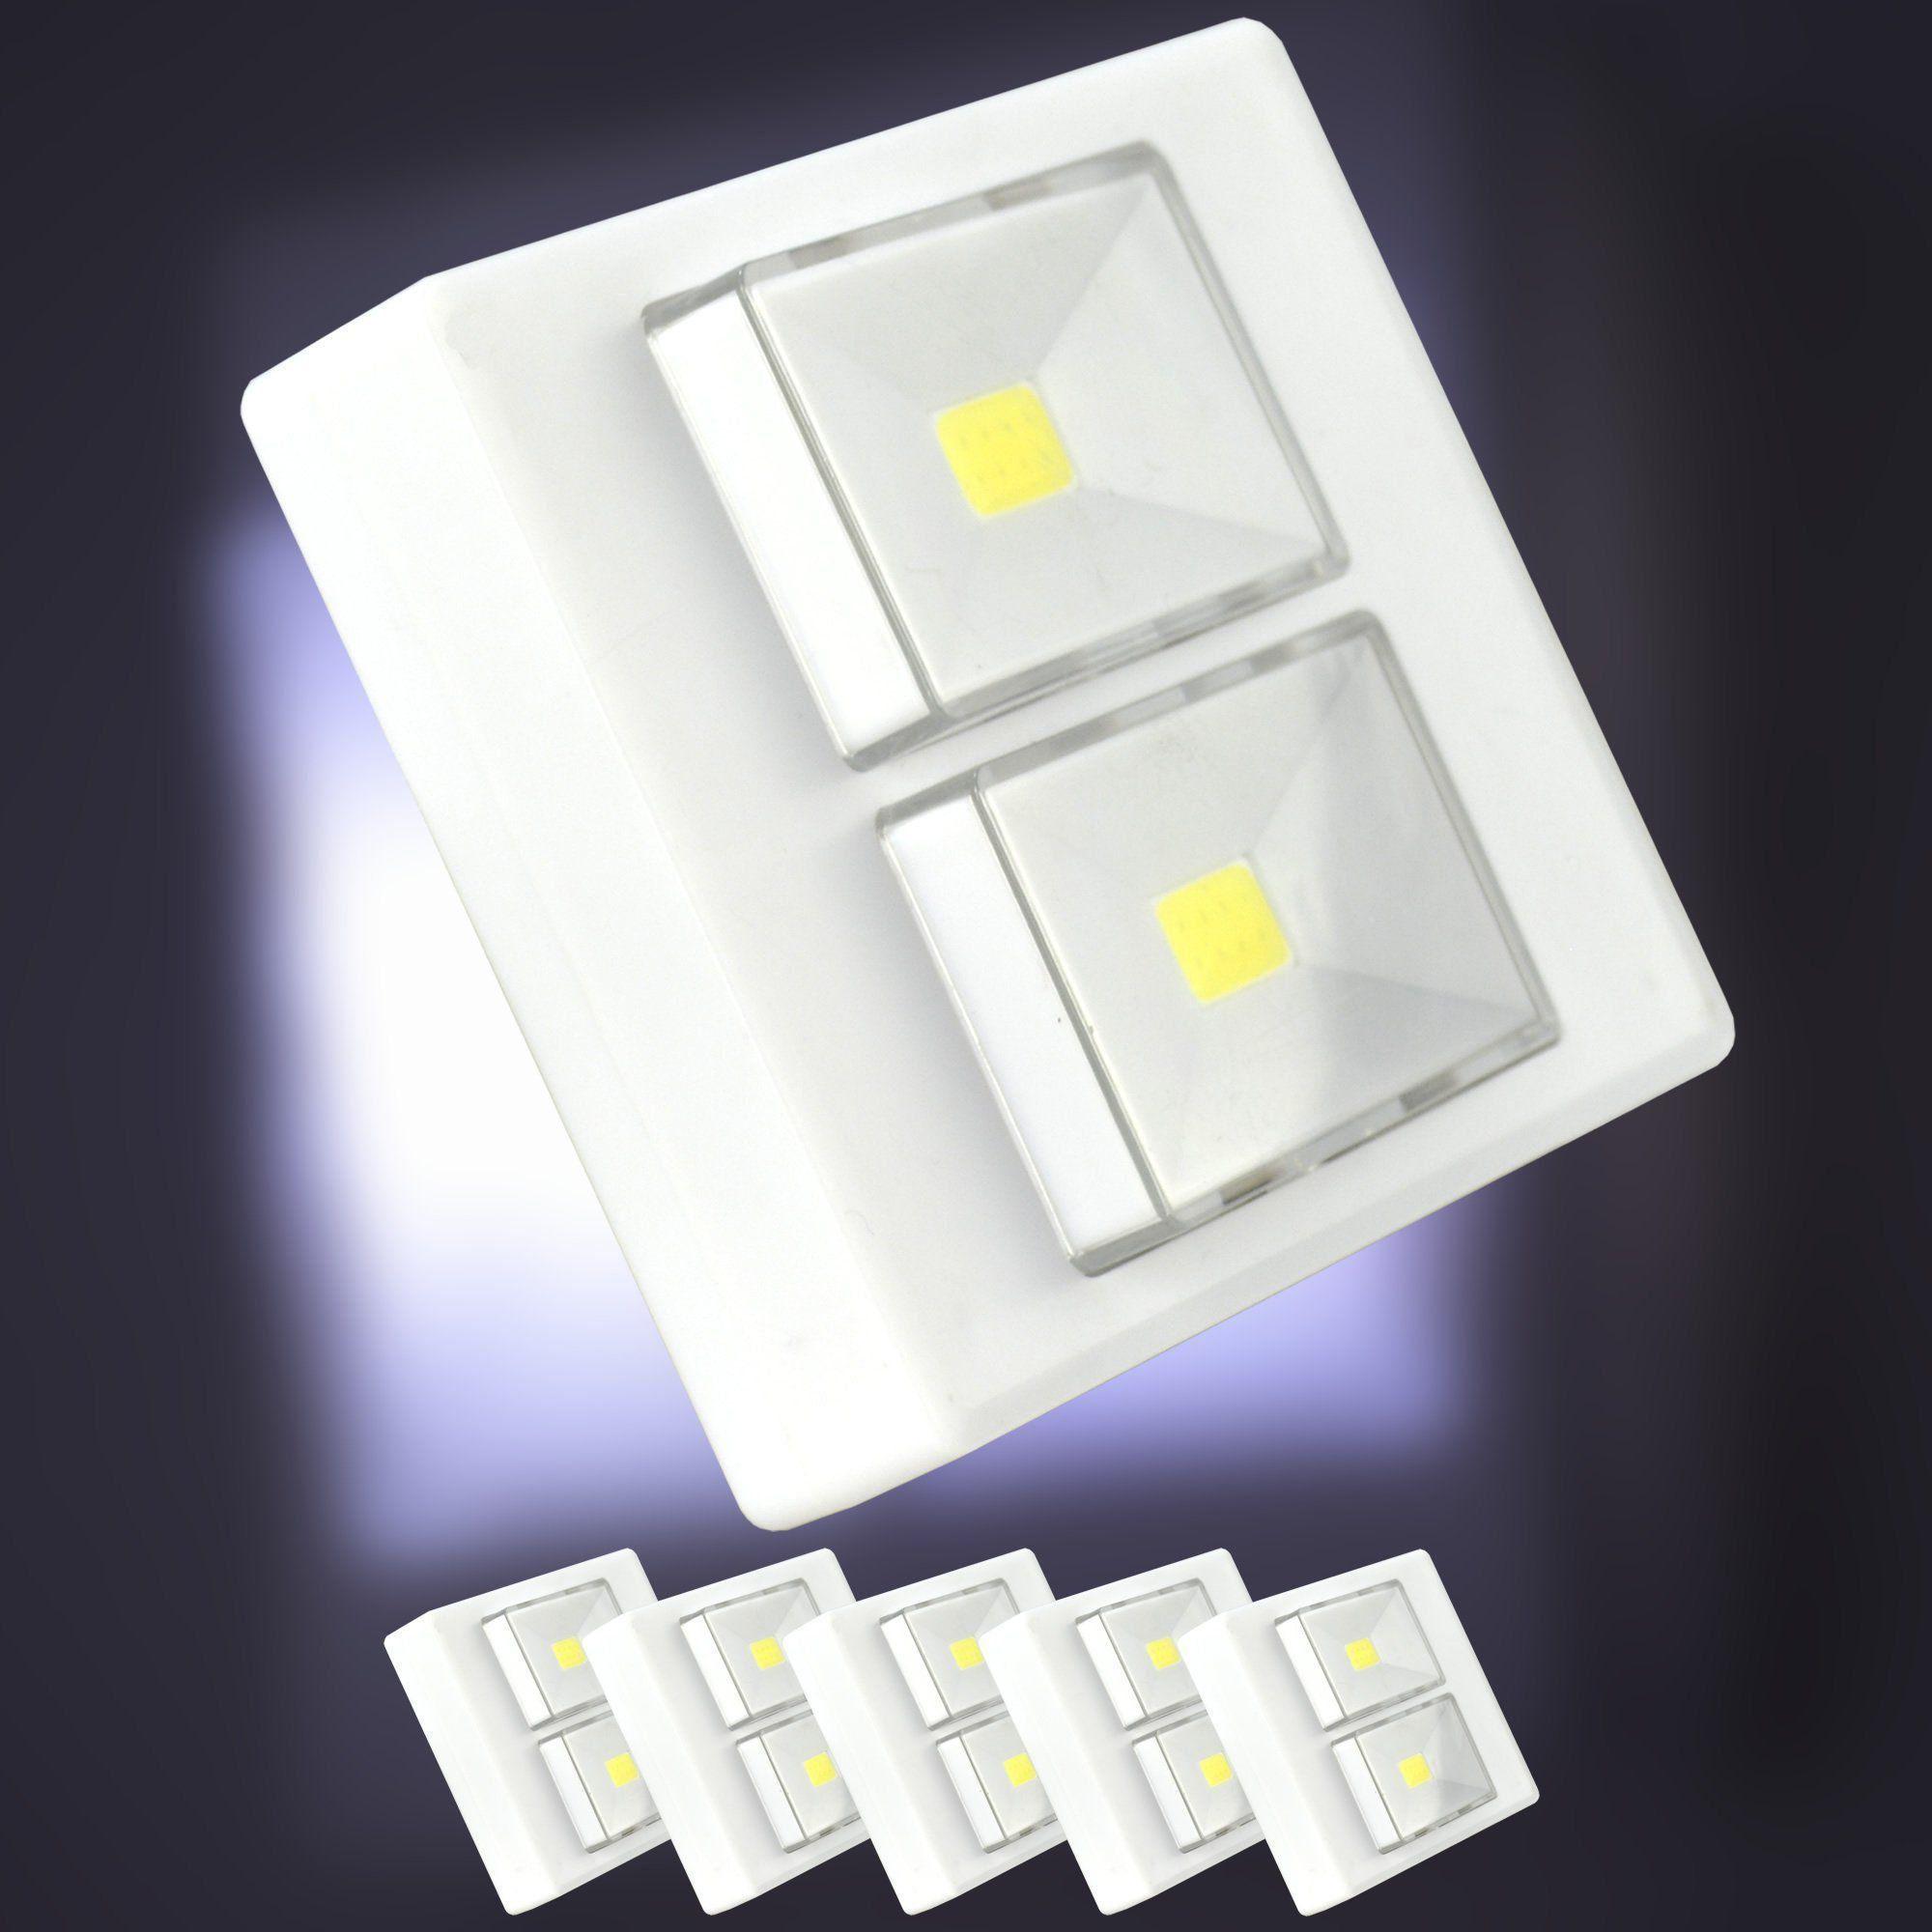 Mini Luminária LED Portátil Com Imã Kit 5 Peças CBRN06861